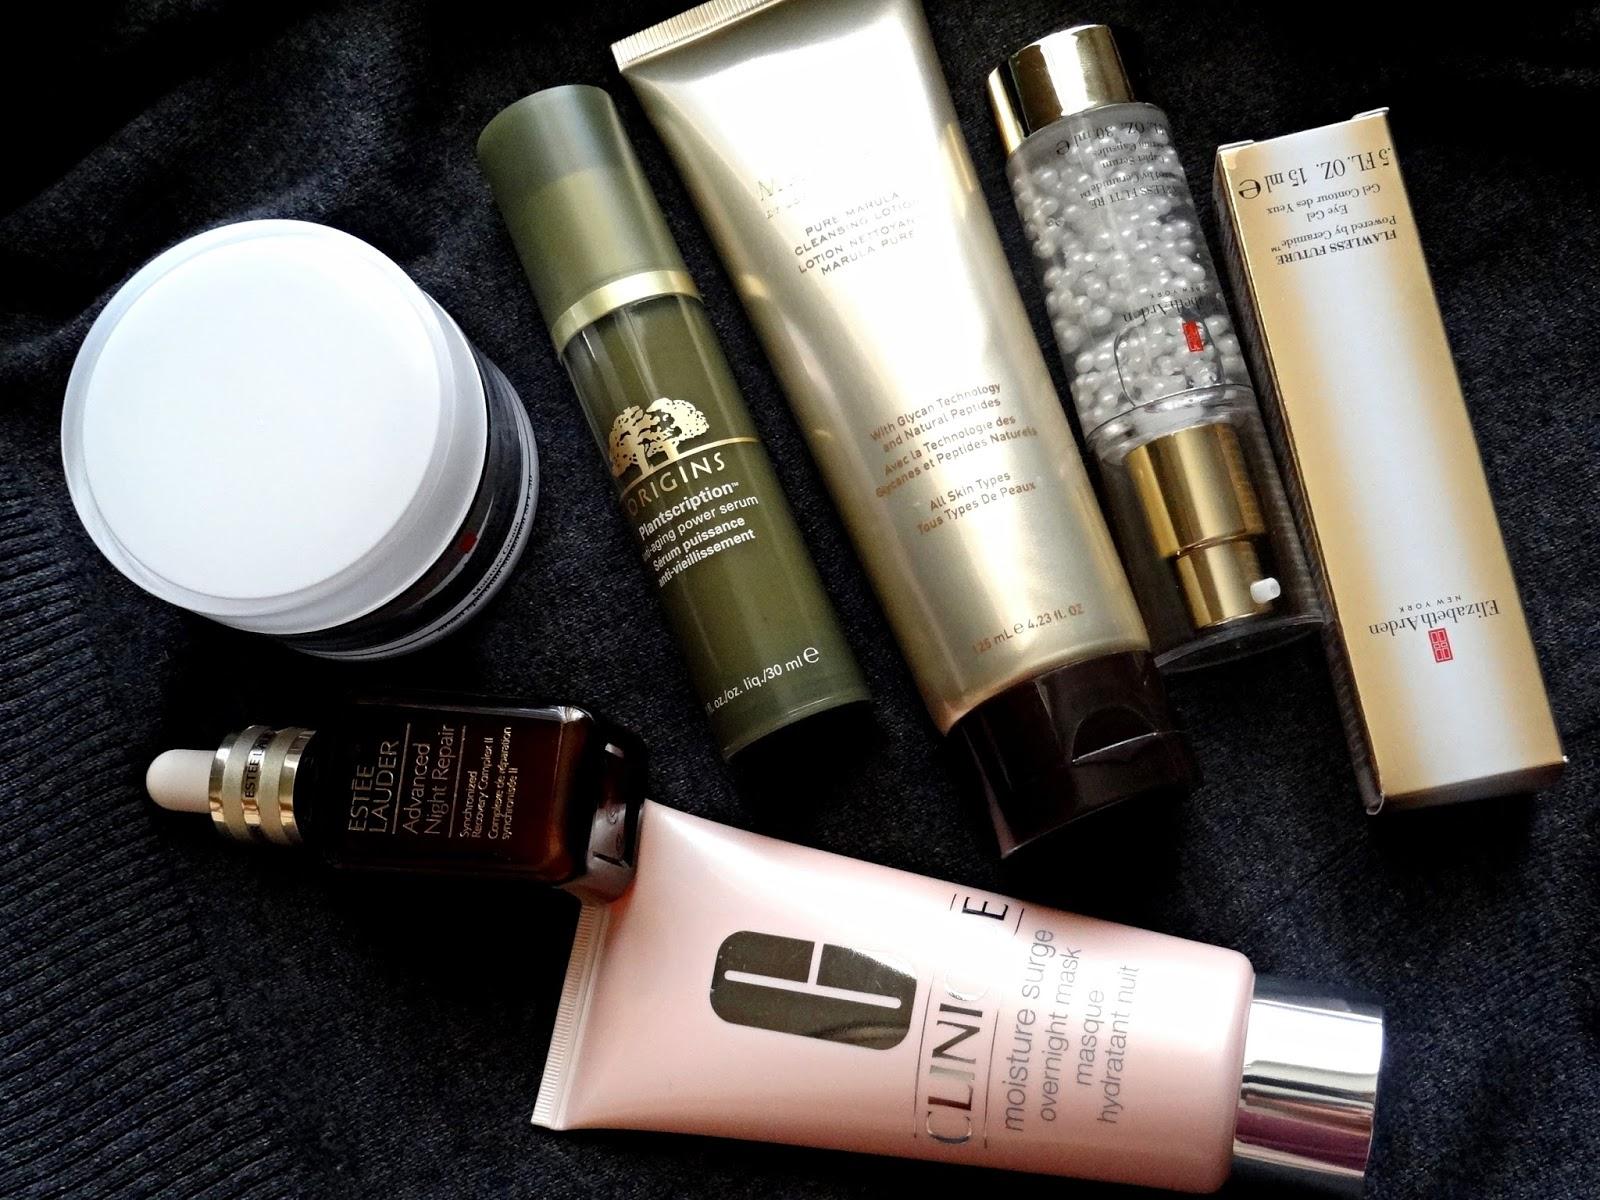 Skincare Trials from Elizabeth Arden, Estee Lauder, John Paul Marula, Origins